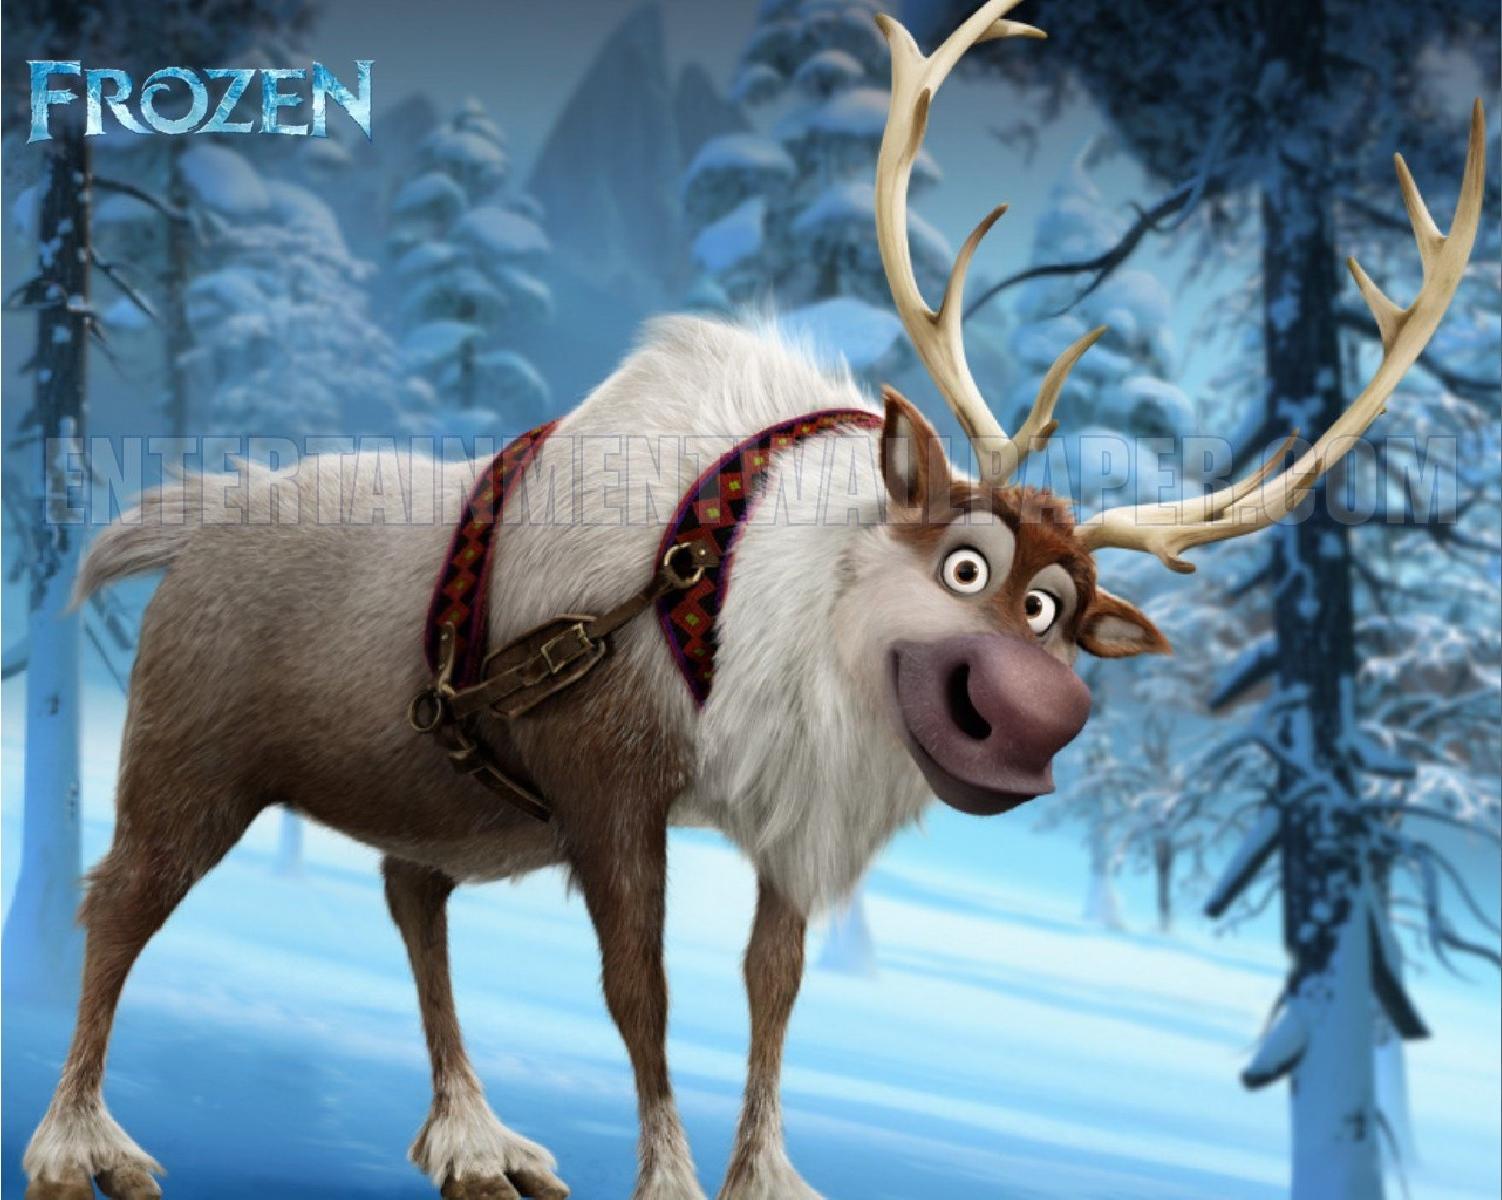 Sven Wallpaper - Frozen Photo (37370200) - Fanpop